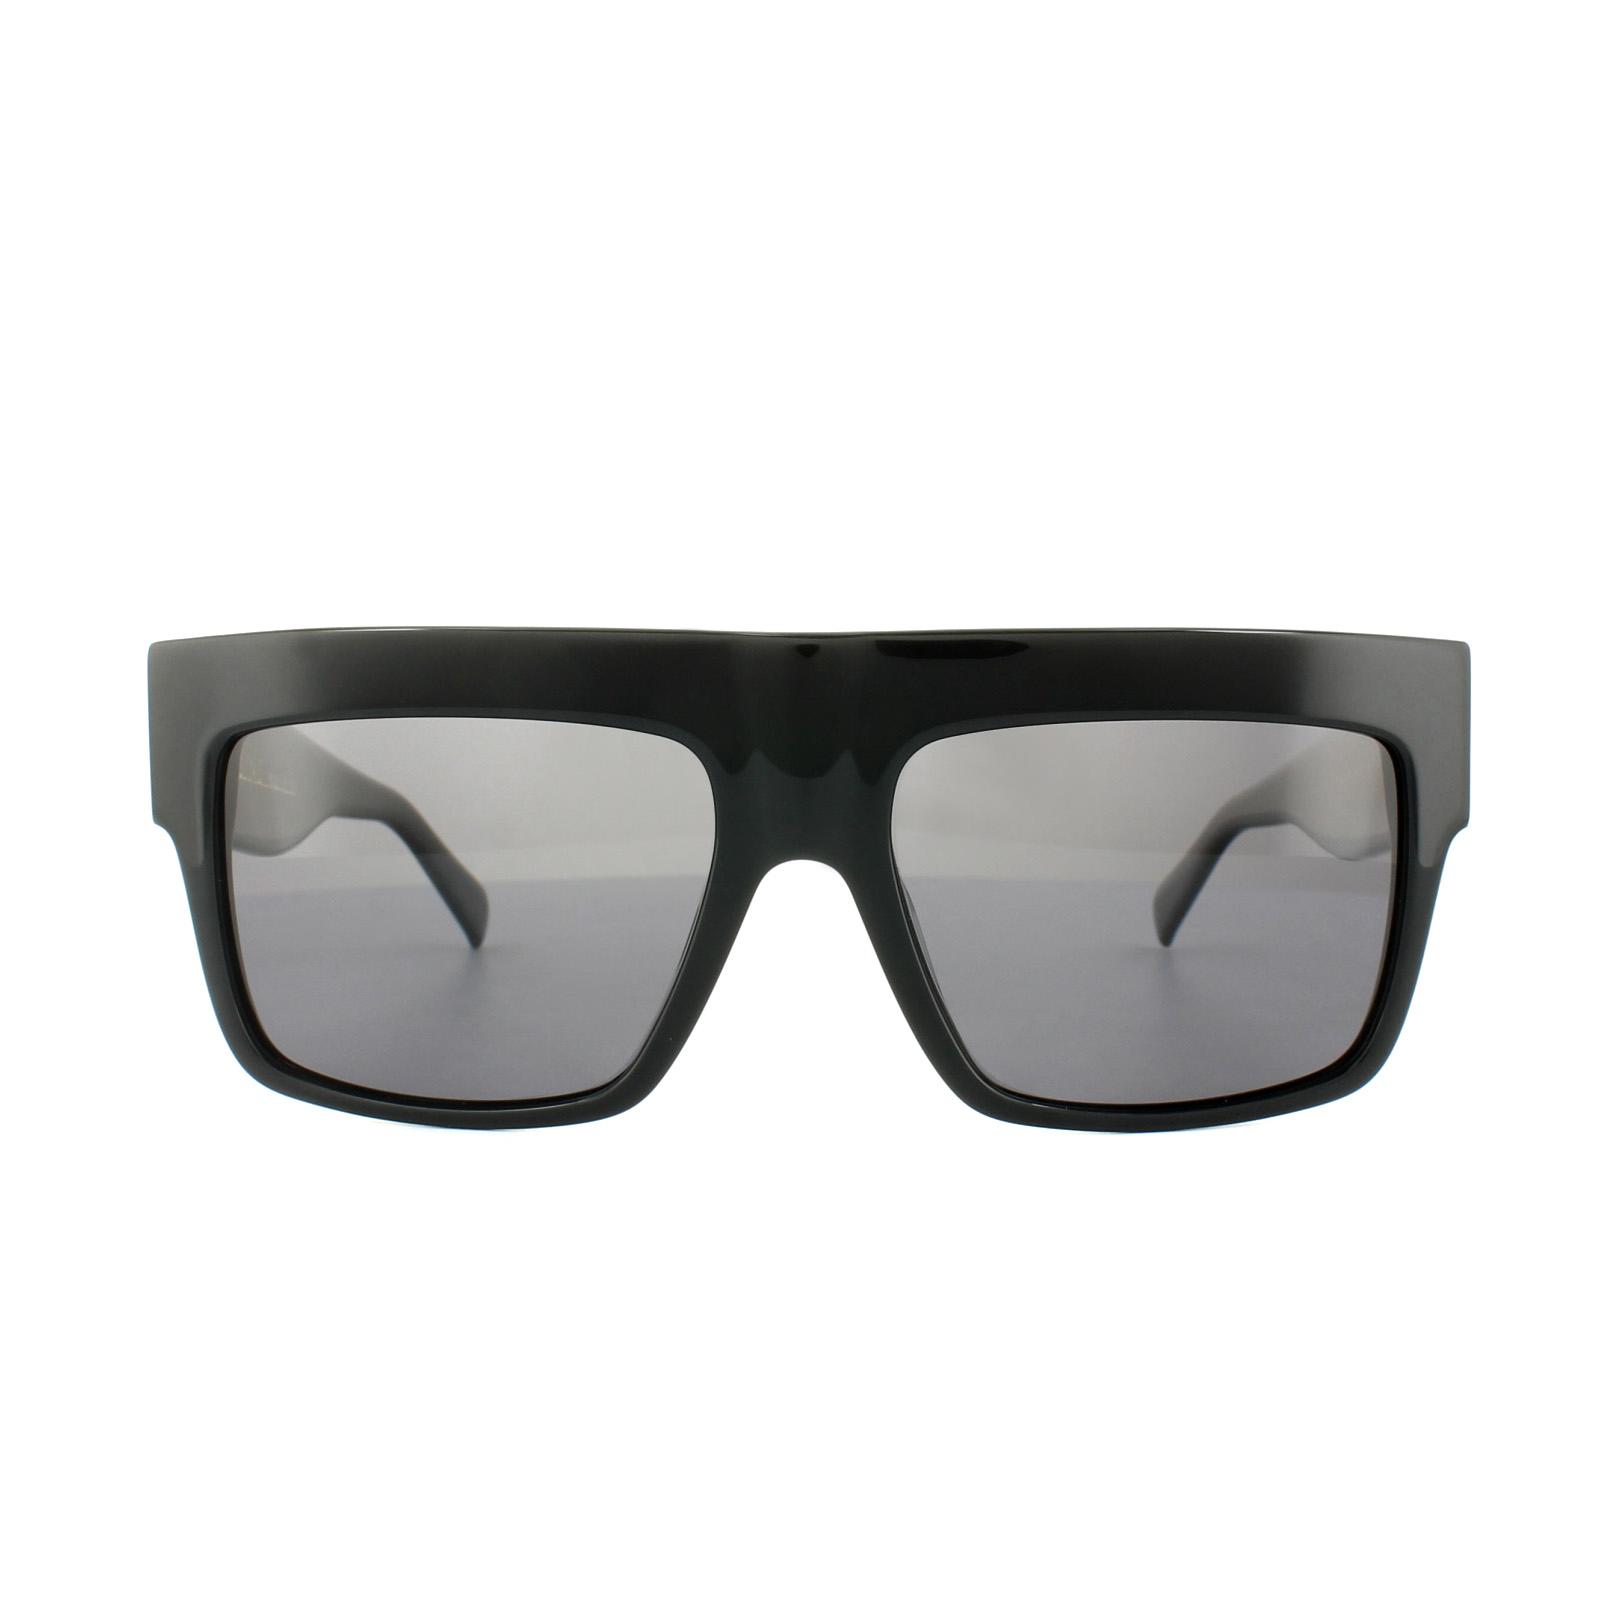 eb35e232f83 Celine Sunglasses 41756 S ZZ Top 807 3H Black Grey Polarized Kim Kardashian  762753456717